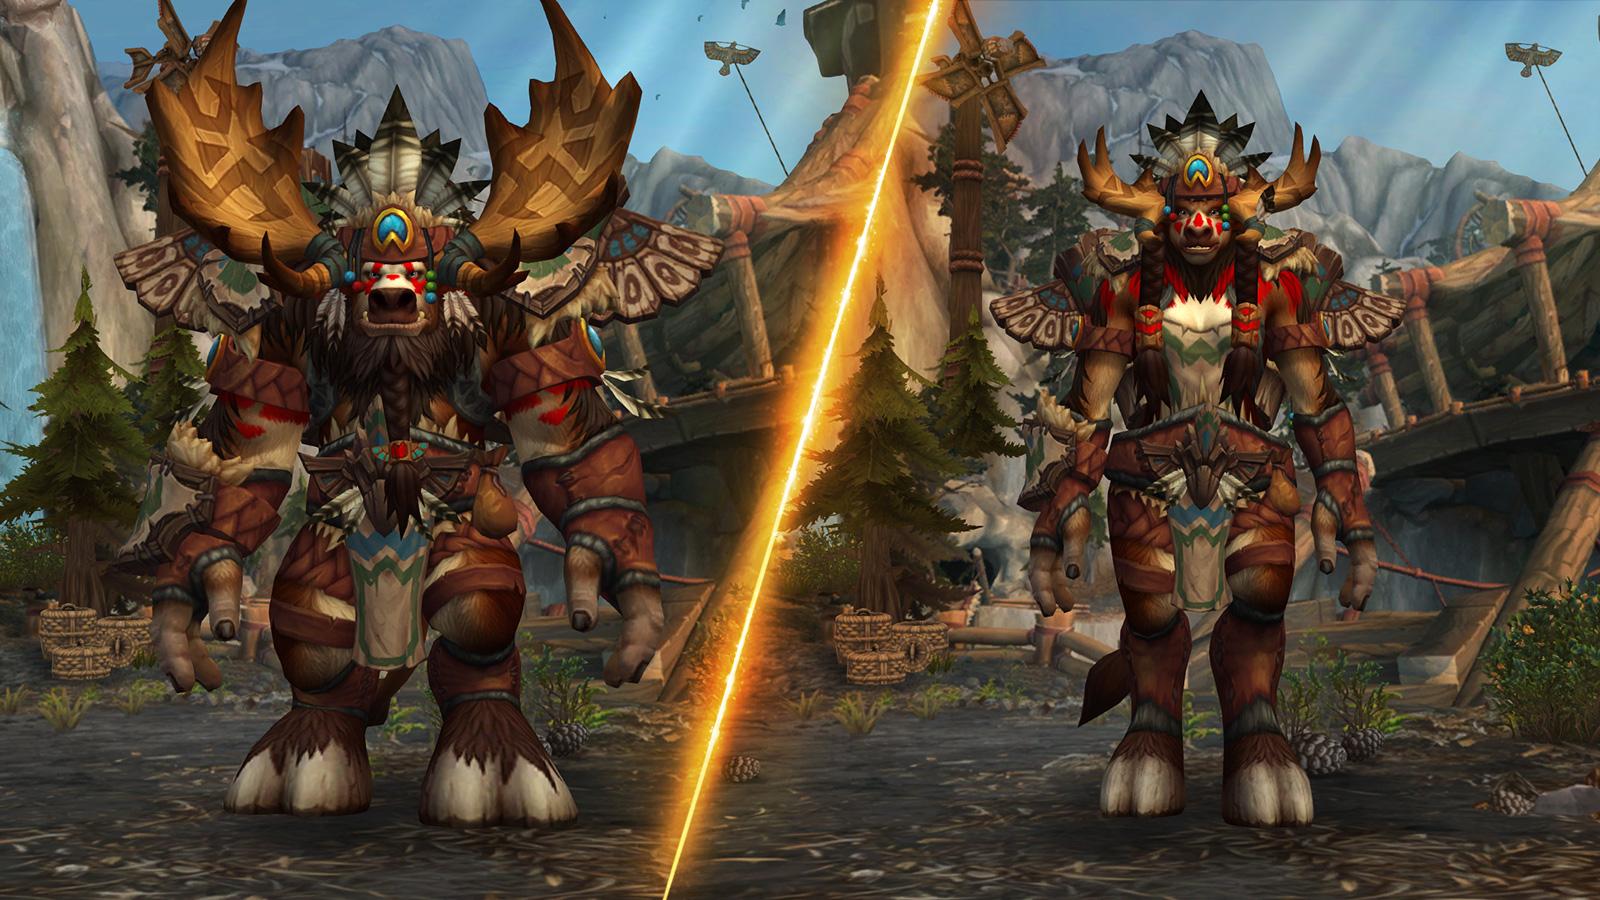 Best Heritage Armor General Discussion World Of Warcraft Forums Tauren heritage armor set questline видео tauren heritage armor questline канала wowhead. best heritage armor general